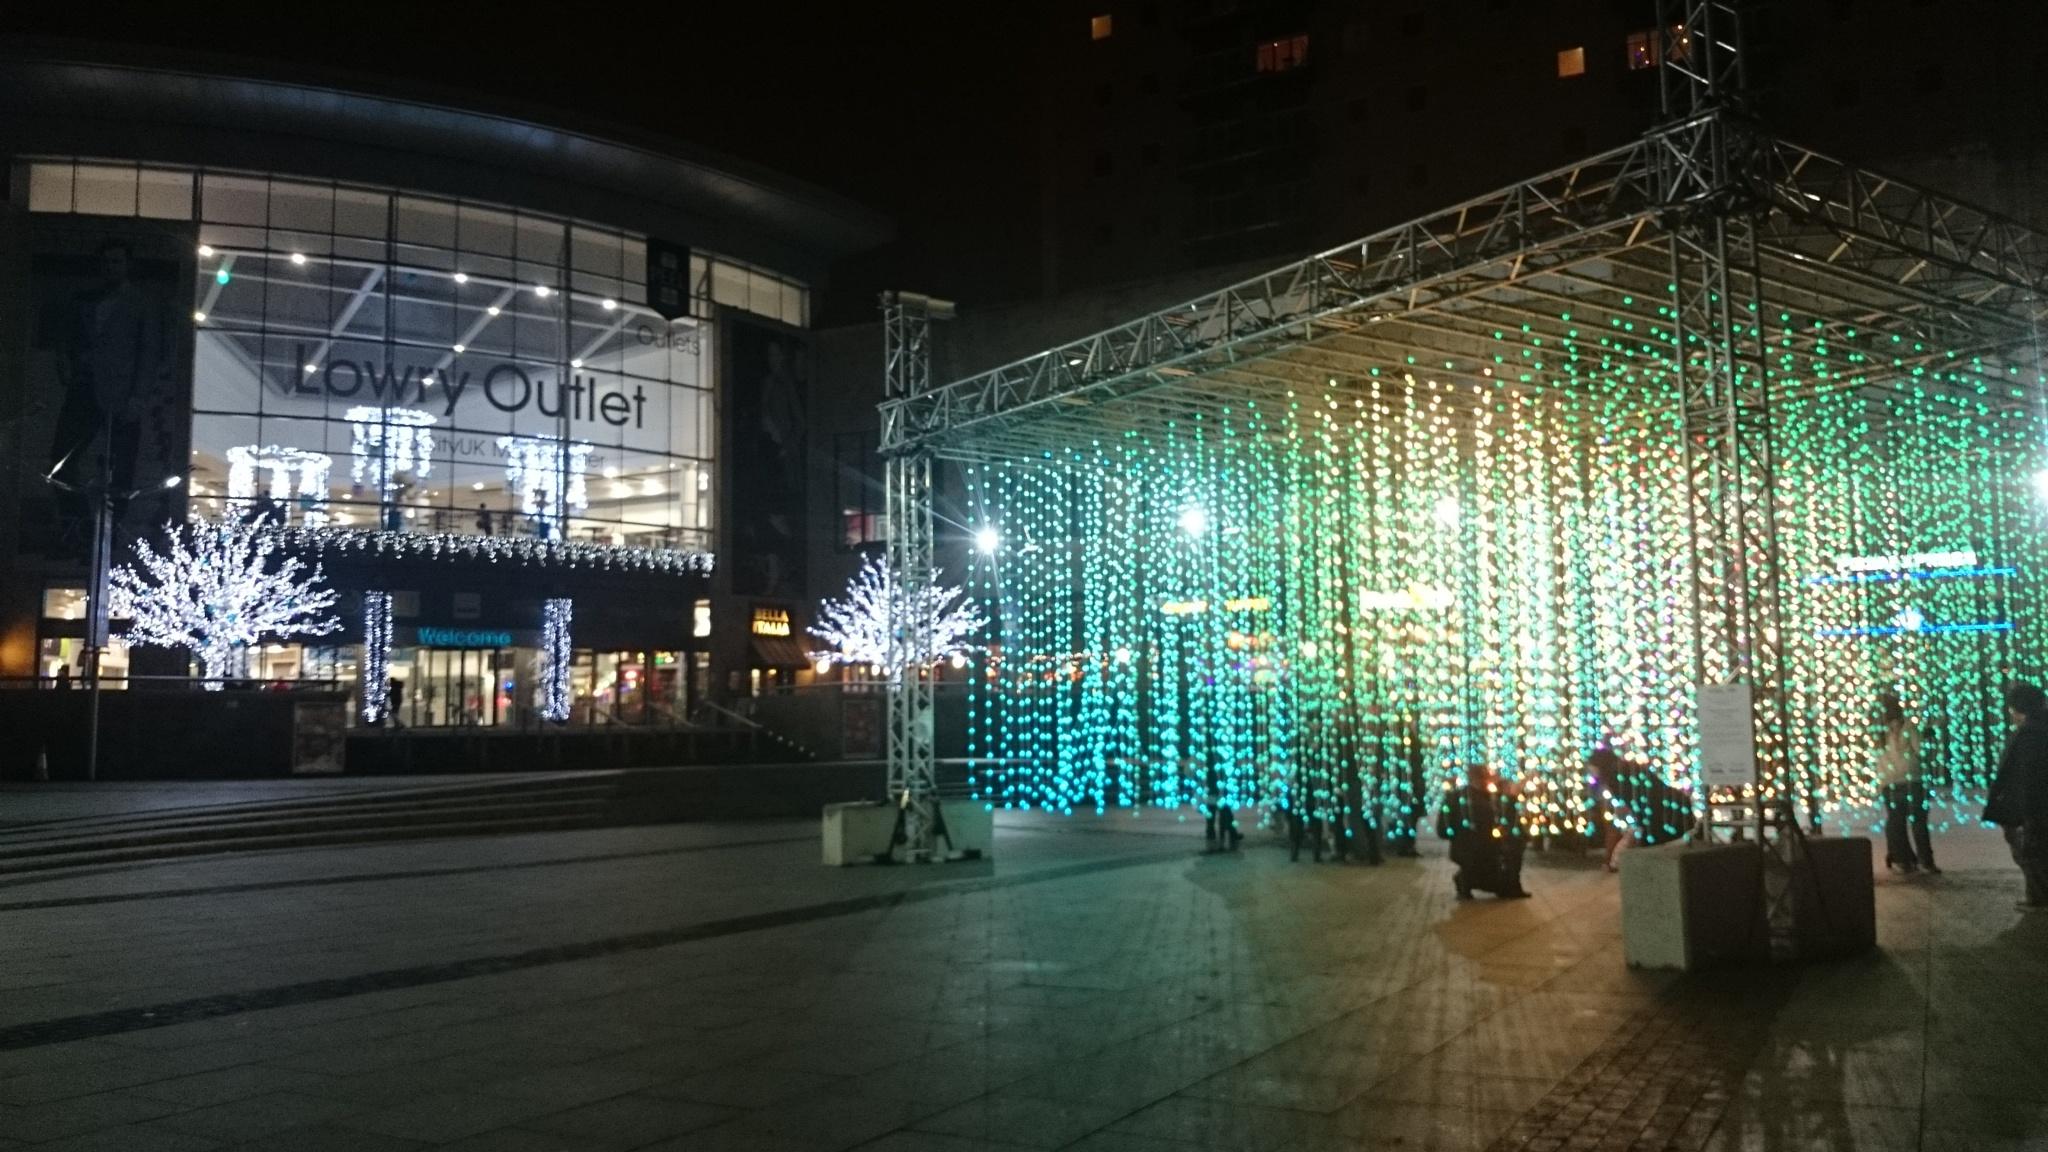 Lowry lights by Phil Downie